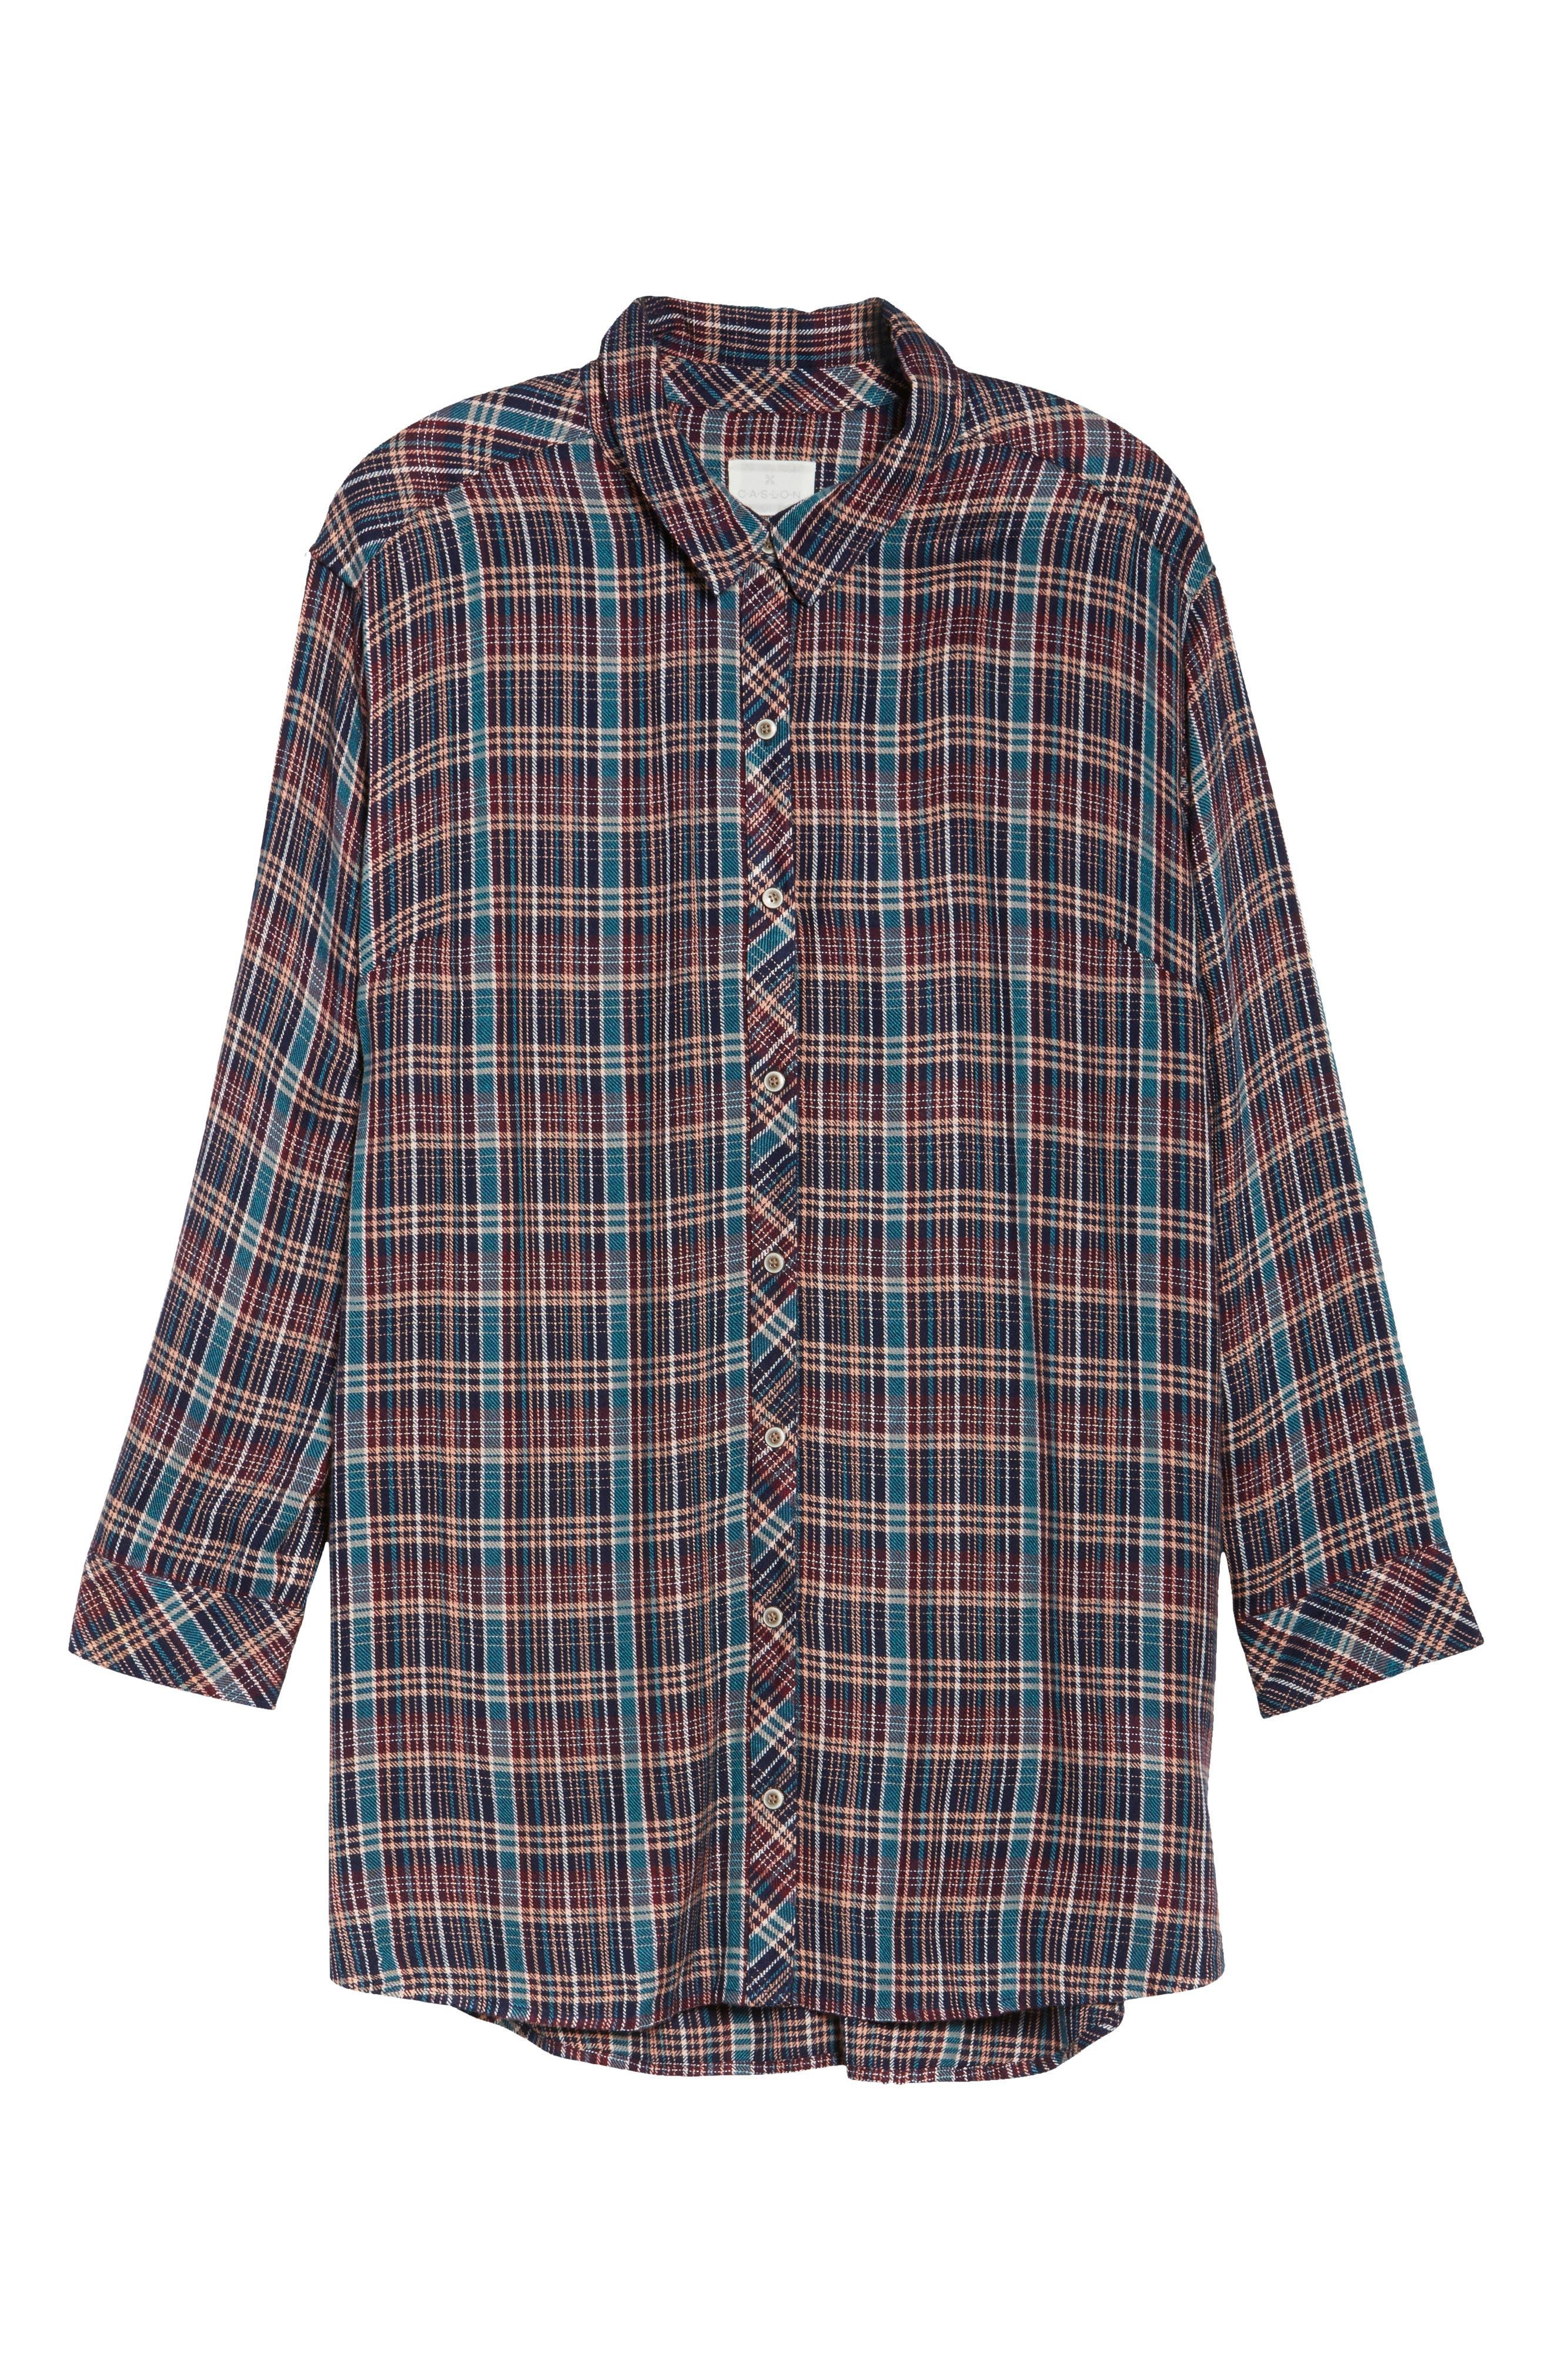 Button Side Detail Tunic Shirt,                             Alternate thumbnail 6, color,                             Navy Karen Plaid